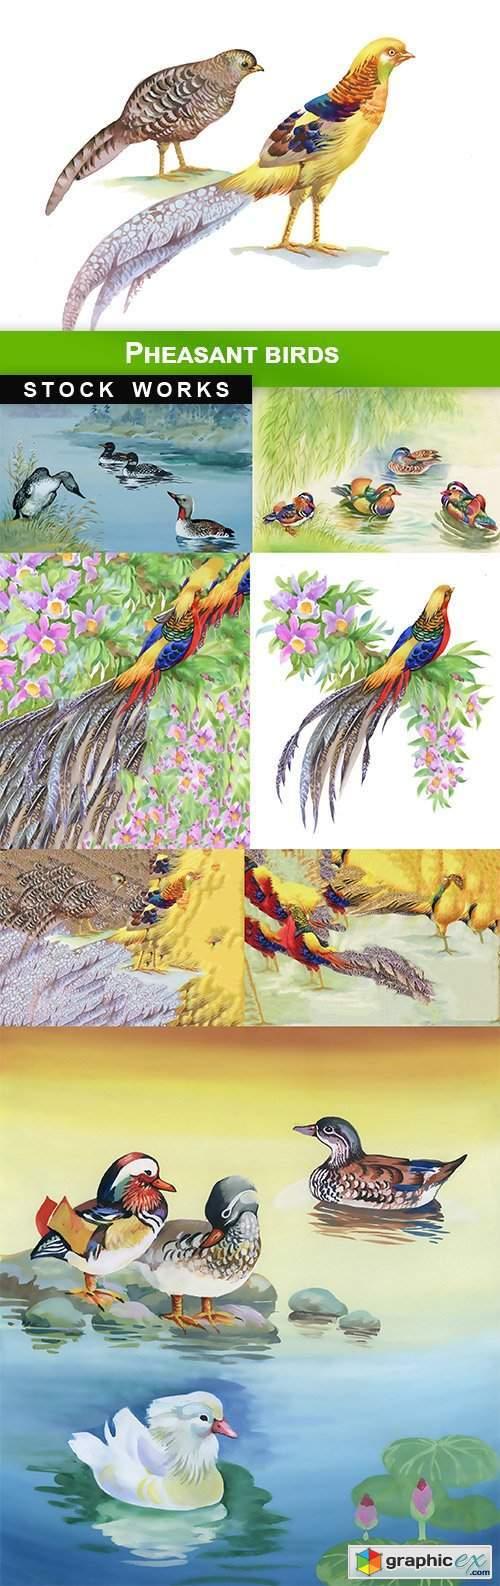 Pheasant birds - 8 UHQ JPEG